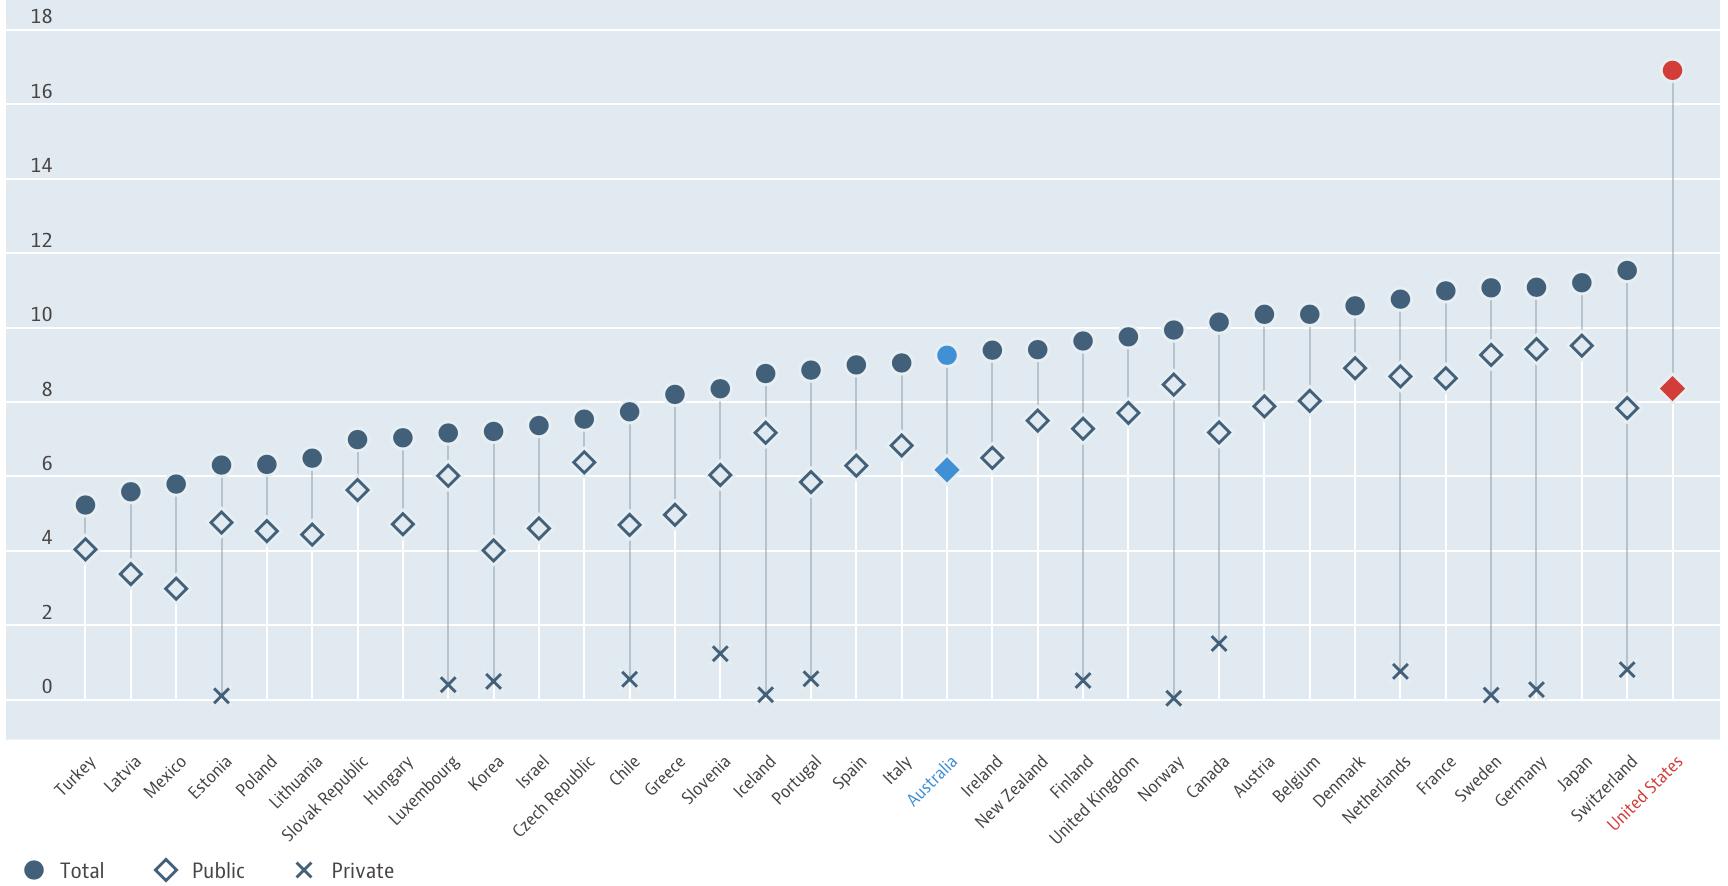 Source:OECD (2017), Health spending (indicator). doi: 10.1787/8643de7e-en (Accessed on 04 May 2017)